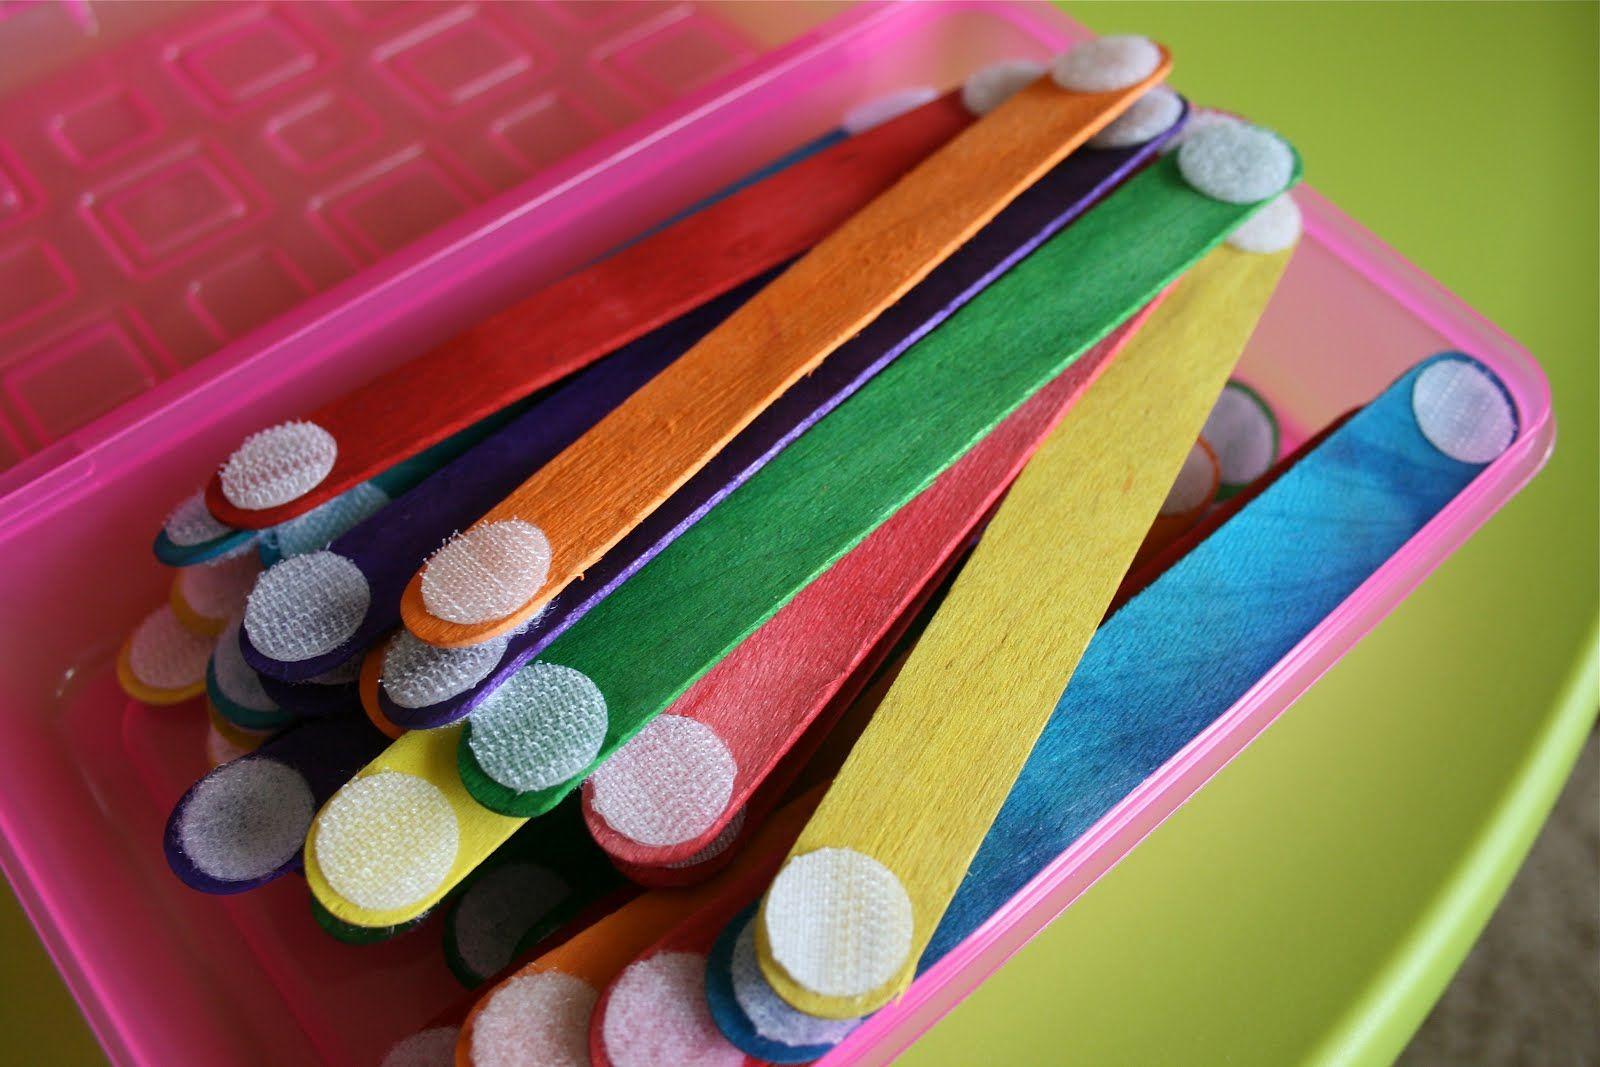 Velcro Crafts Sticks Craft Stick Crafts Toddler Crafts Airplane Activities